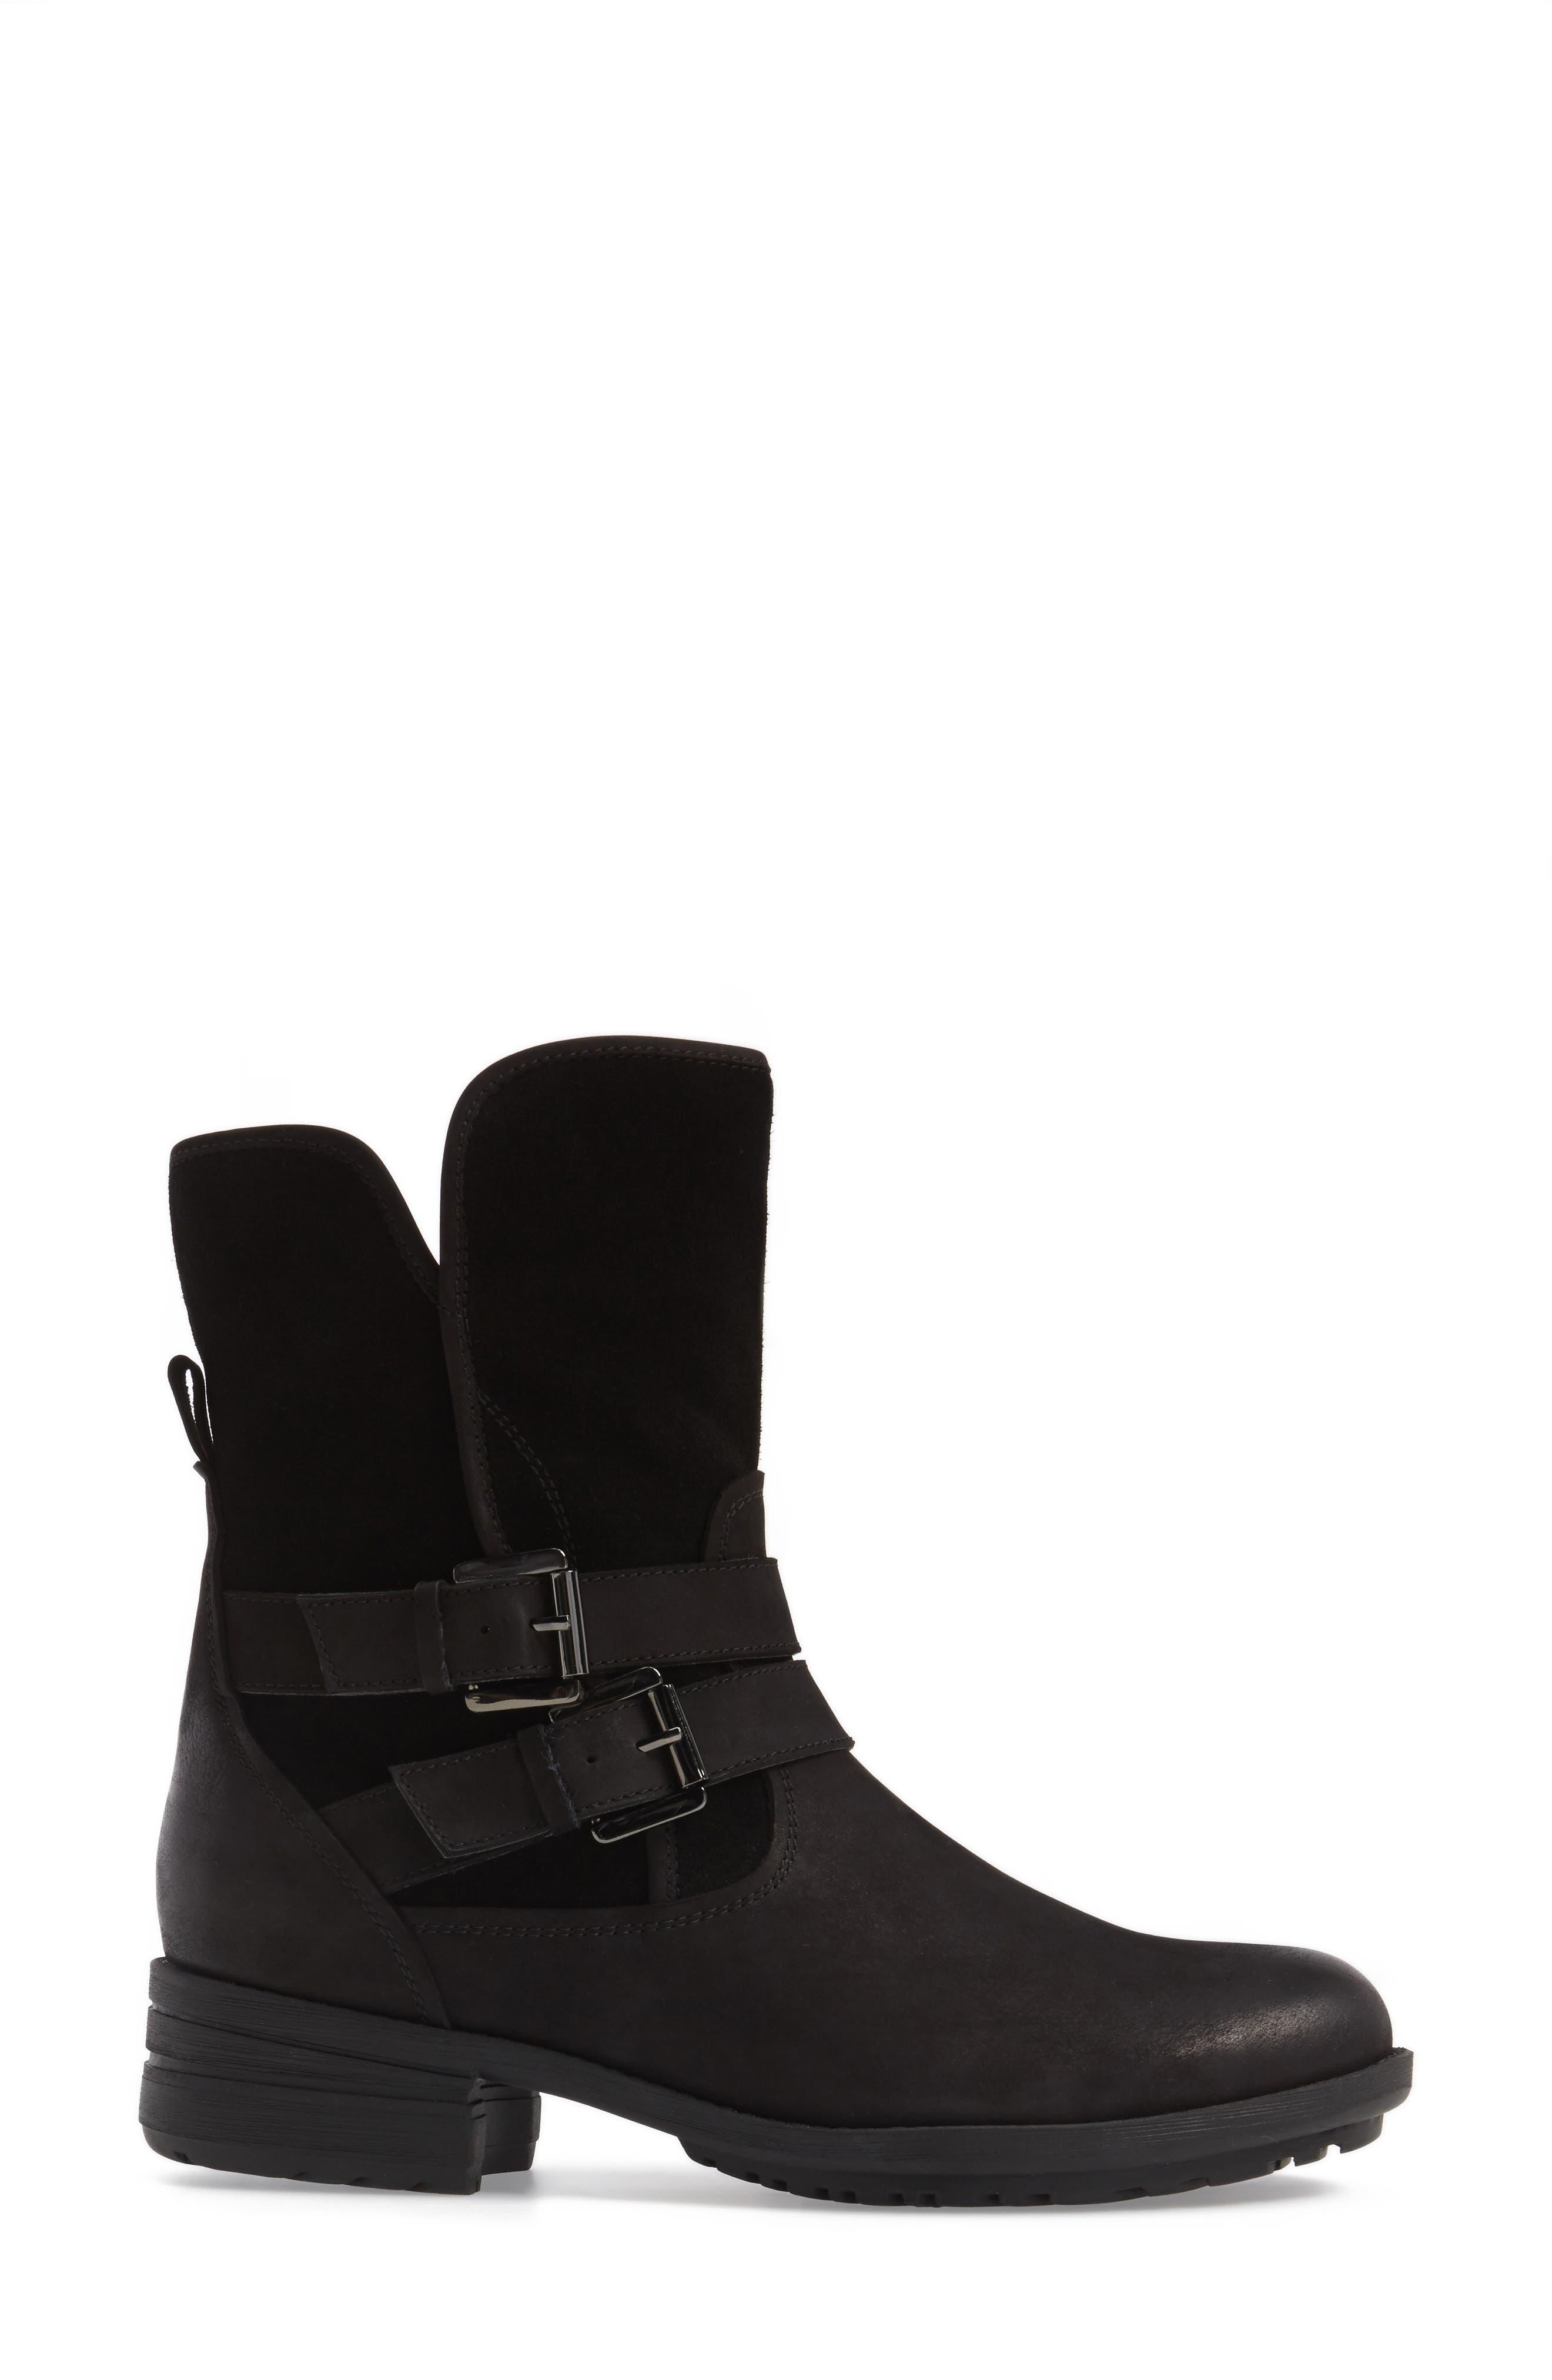 Tula Waterproof Boot,                             Alternate thumbnail 3, color,                             Black Nubuck Leather